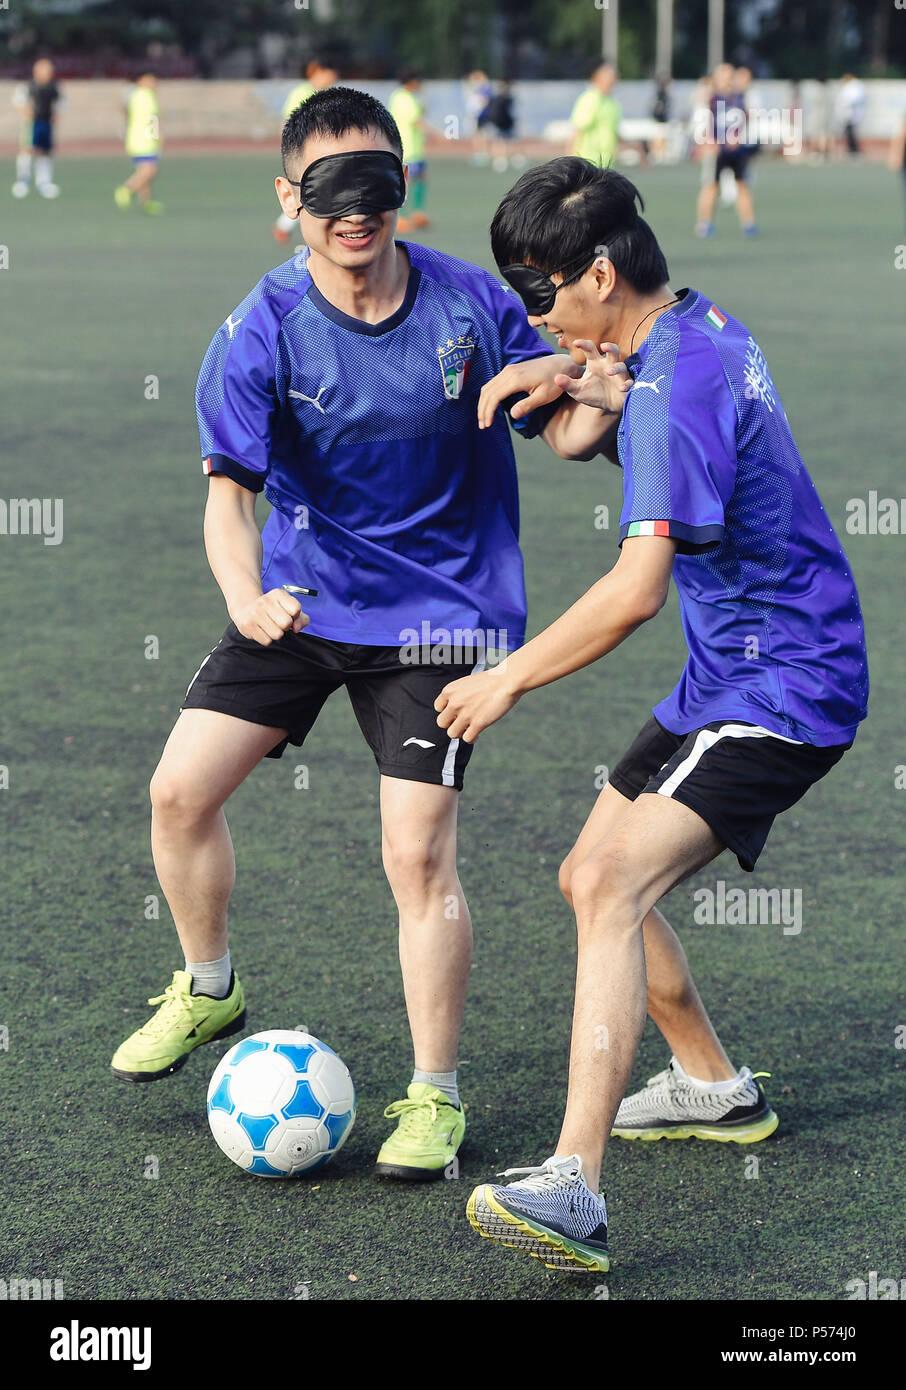 (180625) -- BEIJING, June 25, 2018 (Xinhua) -- Sun Dongyuan (R) and Fan  Changjie play football at the special education school of Changchun  University in ...